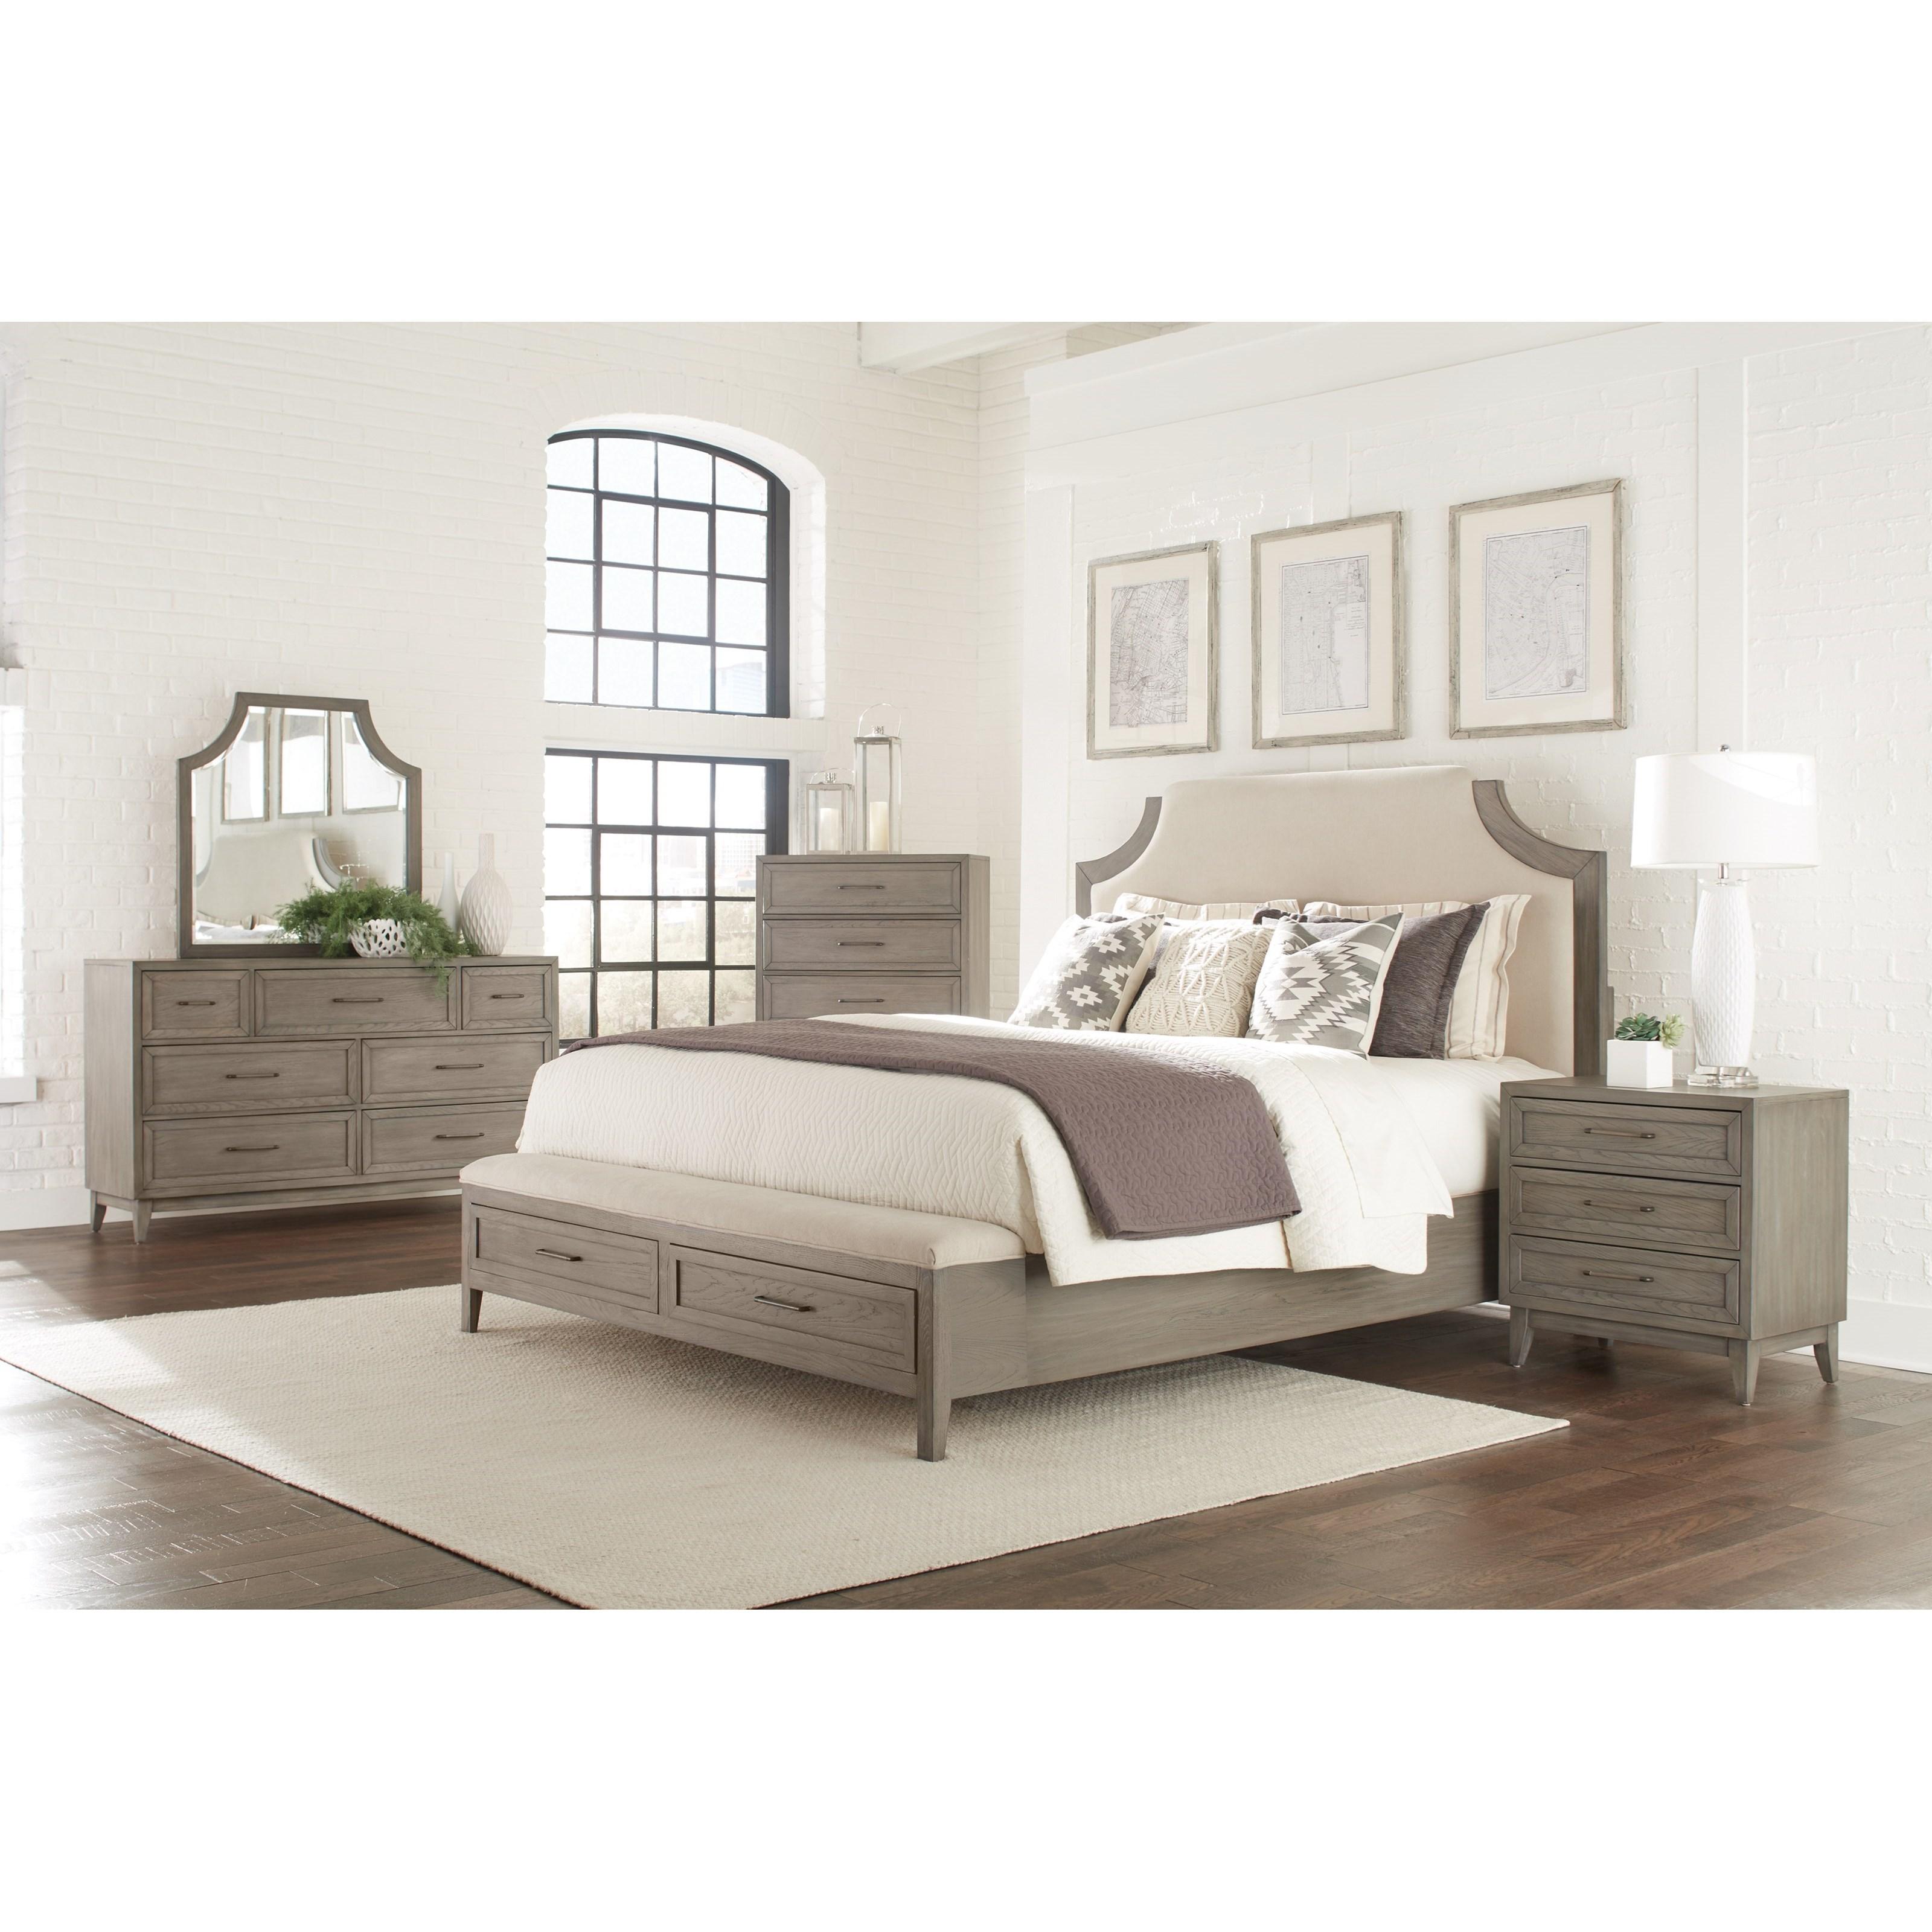 Riverside Furniture Vogue King Upholstered Bed With